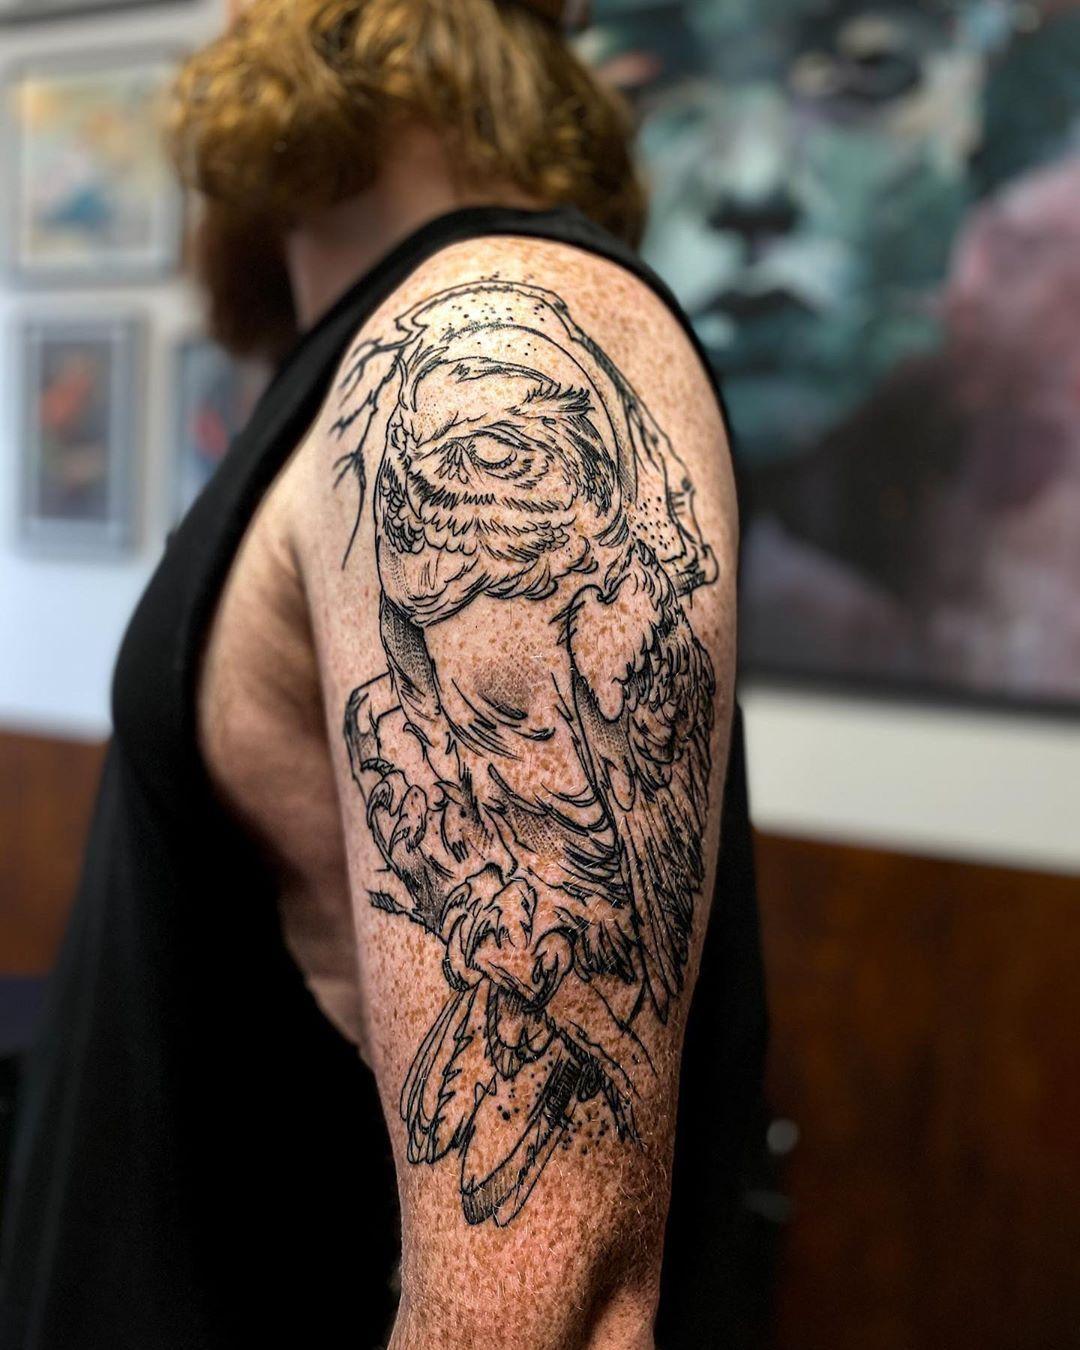 @peter__hessel tak for endnu en dag og endnu et fedt projekt ..Done at @cphnoir@intenzetattooink @inkeeze @fkirons @davincineedles @leadthefollowers #sleevetattoo #sleeve #tattoodo #savemyink #inkedmag #inkjunkeyz #inkedmag #tattoorealistic #tattoistartmag #silverbackink #inkeeze #killerink #killerinktattoosupplies #inkig #sullenclothing #justblackink #tattooartists #tattedskiny #tattoos #tattoo #artist #realisticink #tattoolifemagazine #skinartmag #thebestbngtattooartists #theblackandgreytattoo